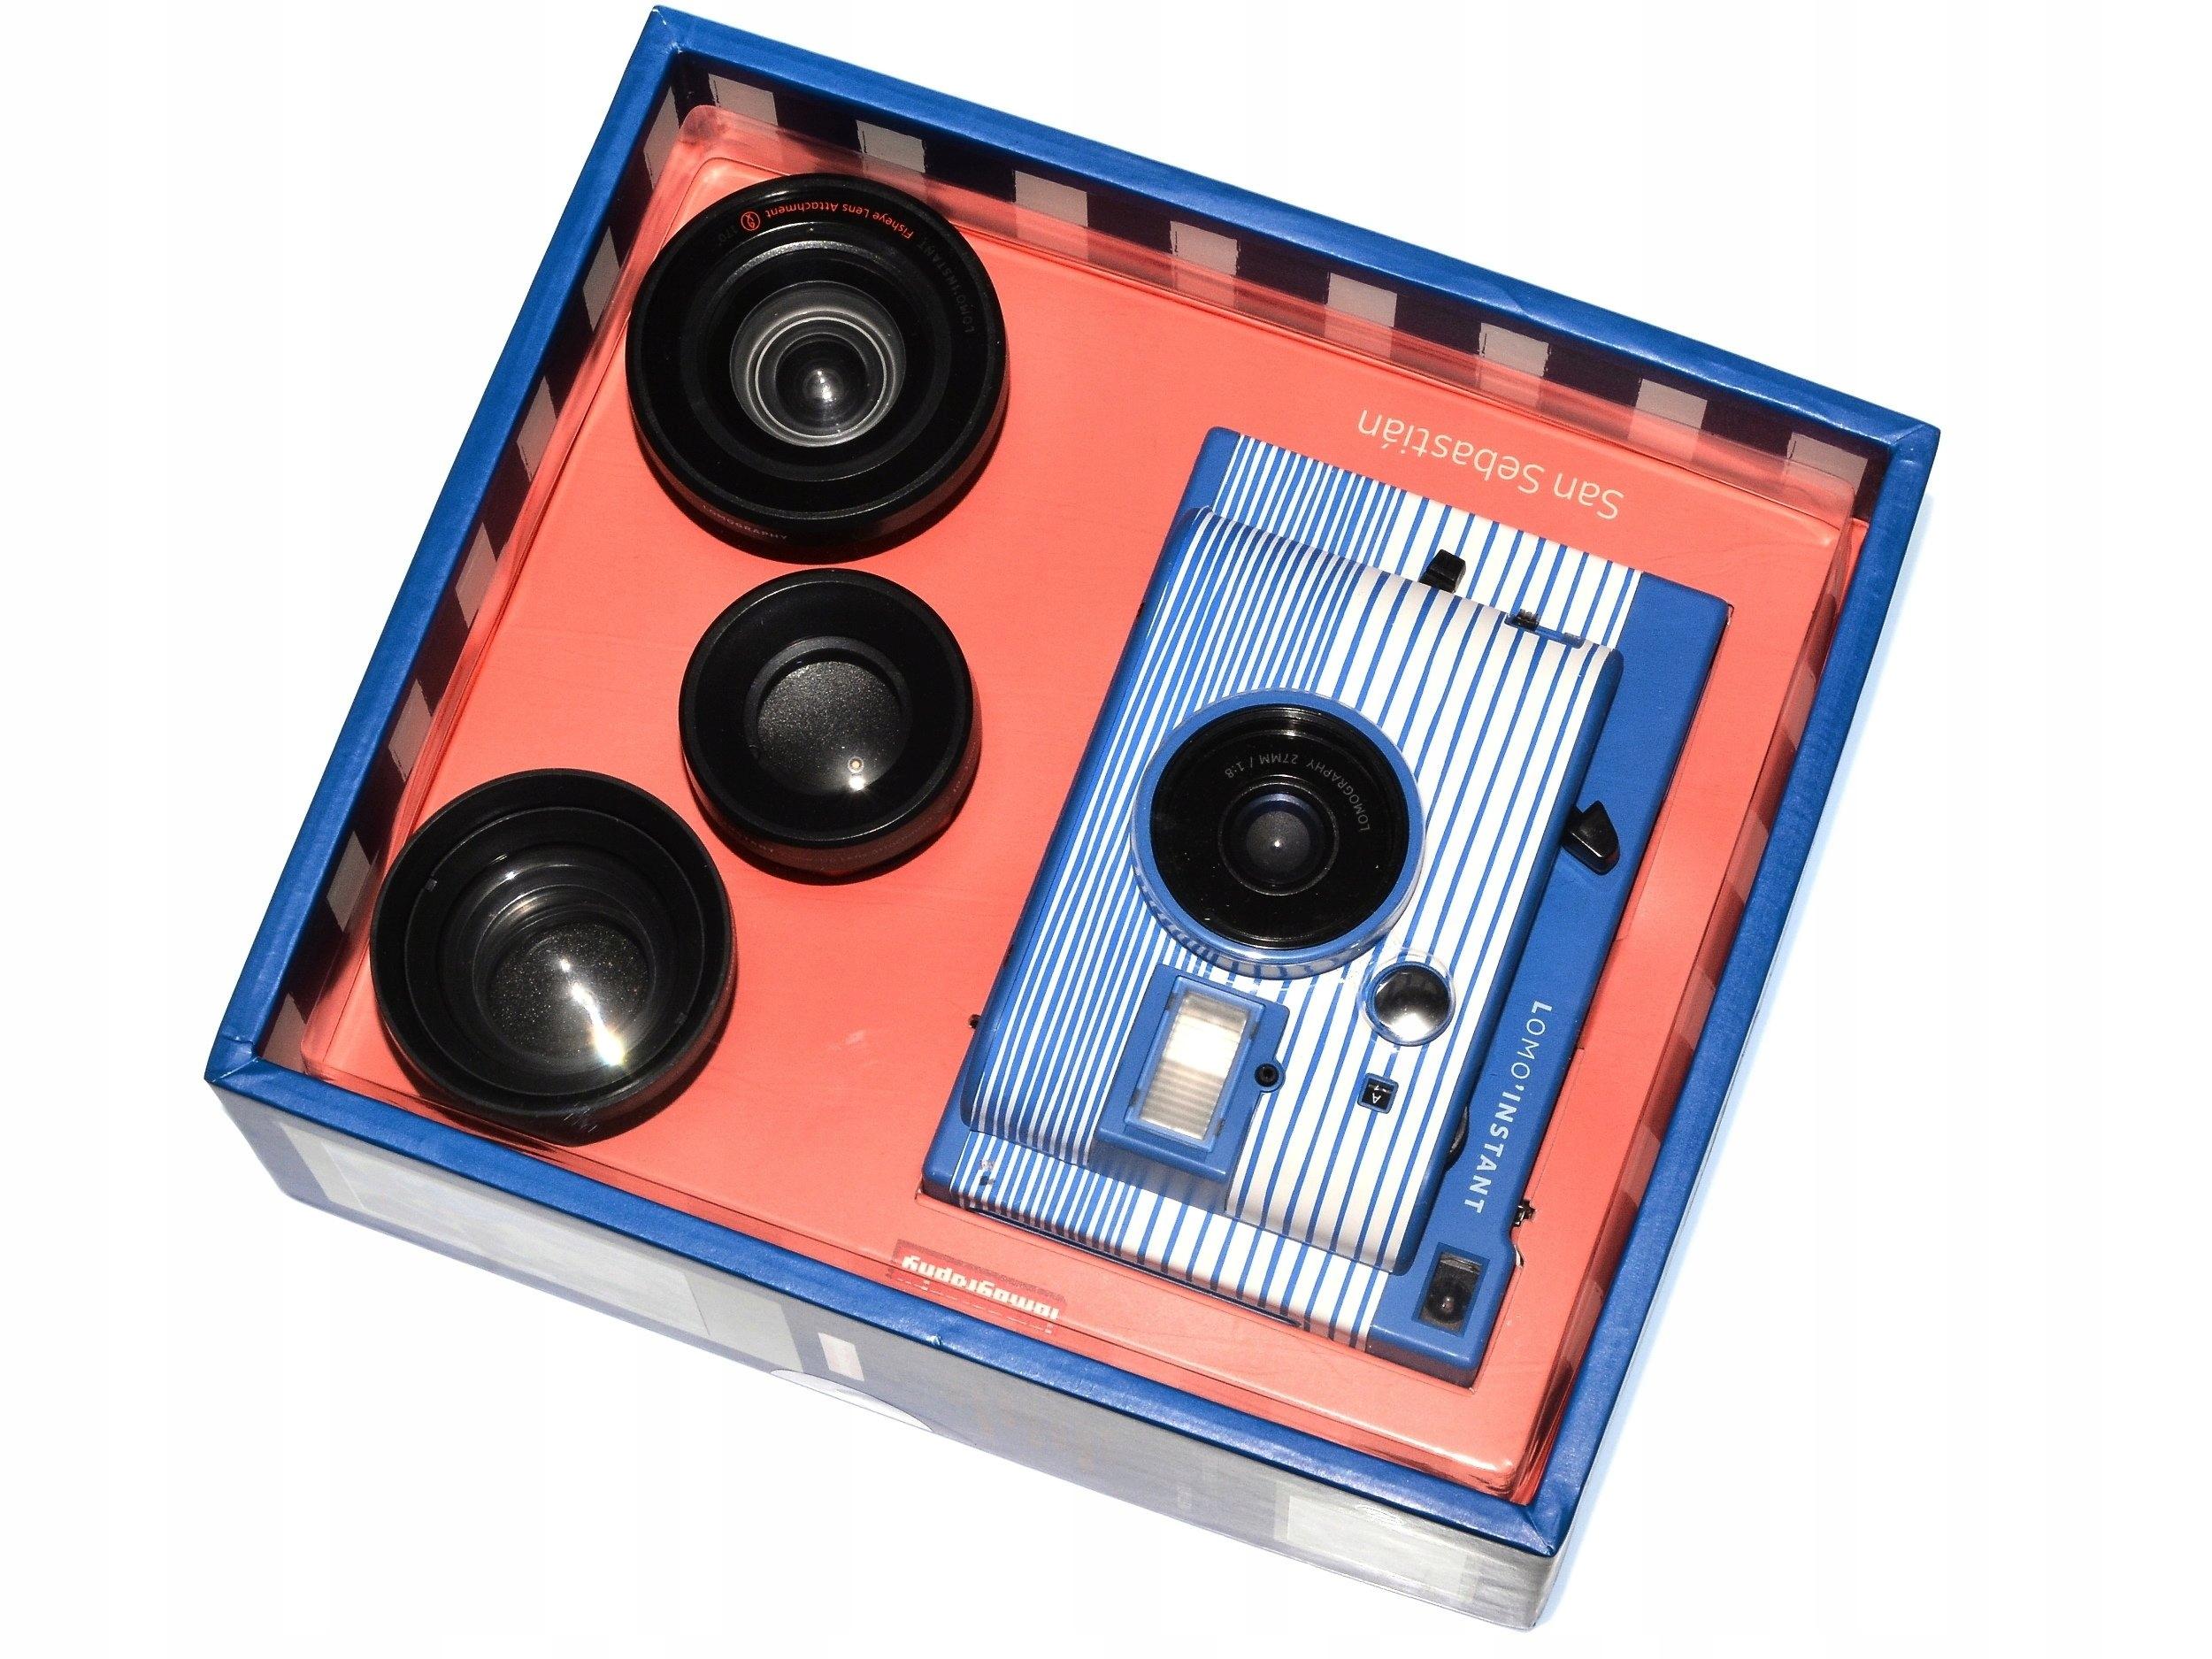 Lomography Lomo Instant Mini San Sebastian 3 Obiek 7094444945 Camera Lenses Edition